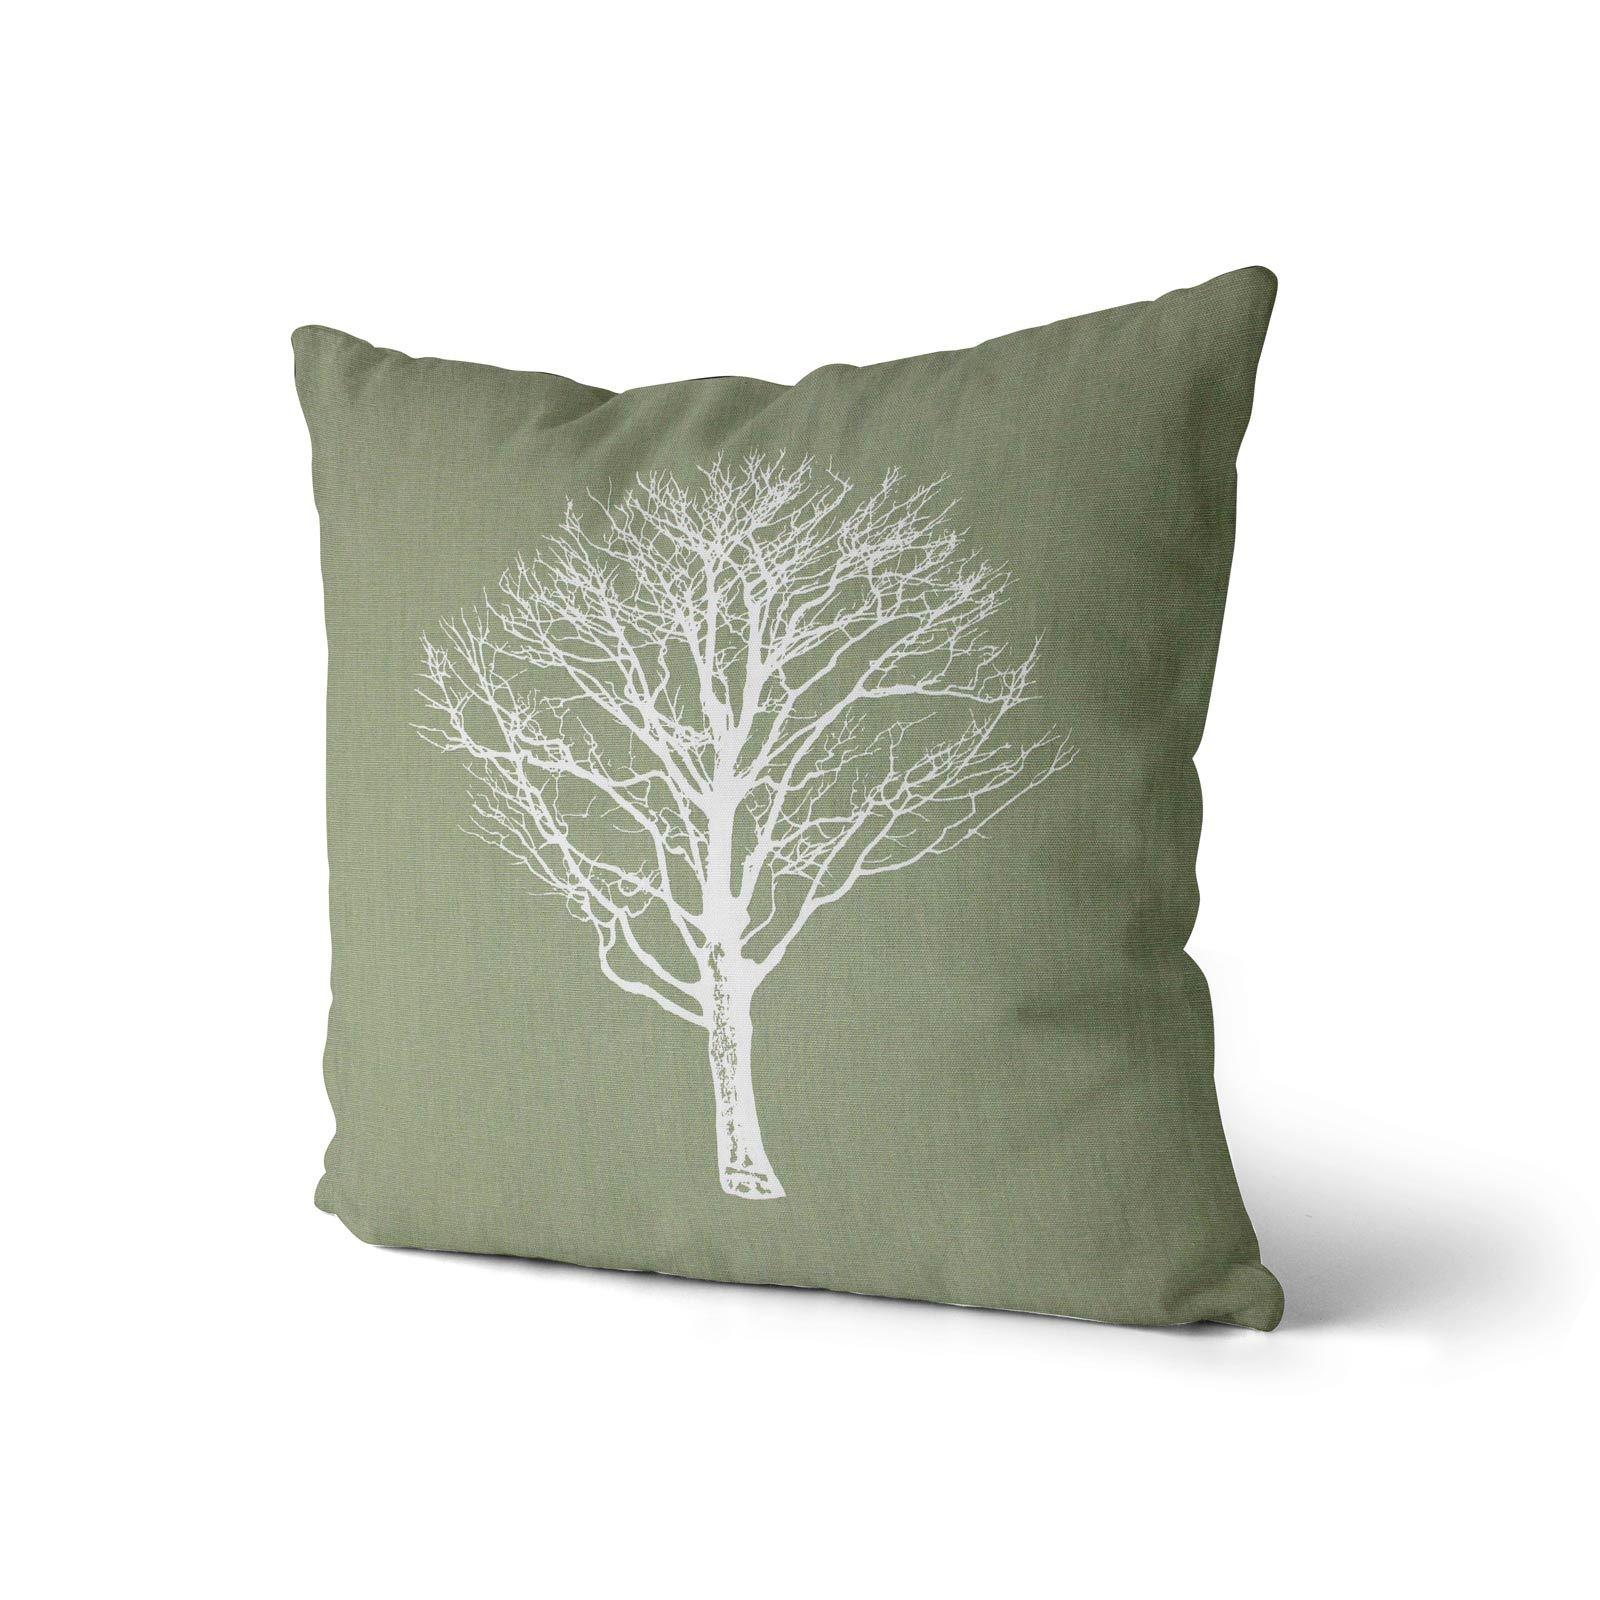 Woodland-Trees-Cushion-Cover-Modern-Reversible-Tree-Print-Covers-17-034-x-17-034 thumbnail 27